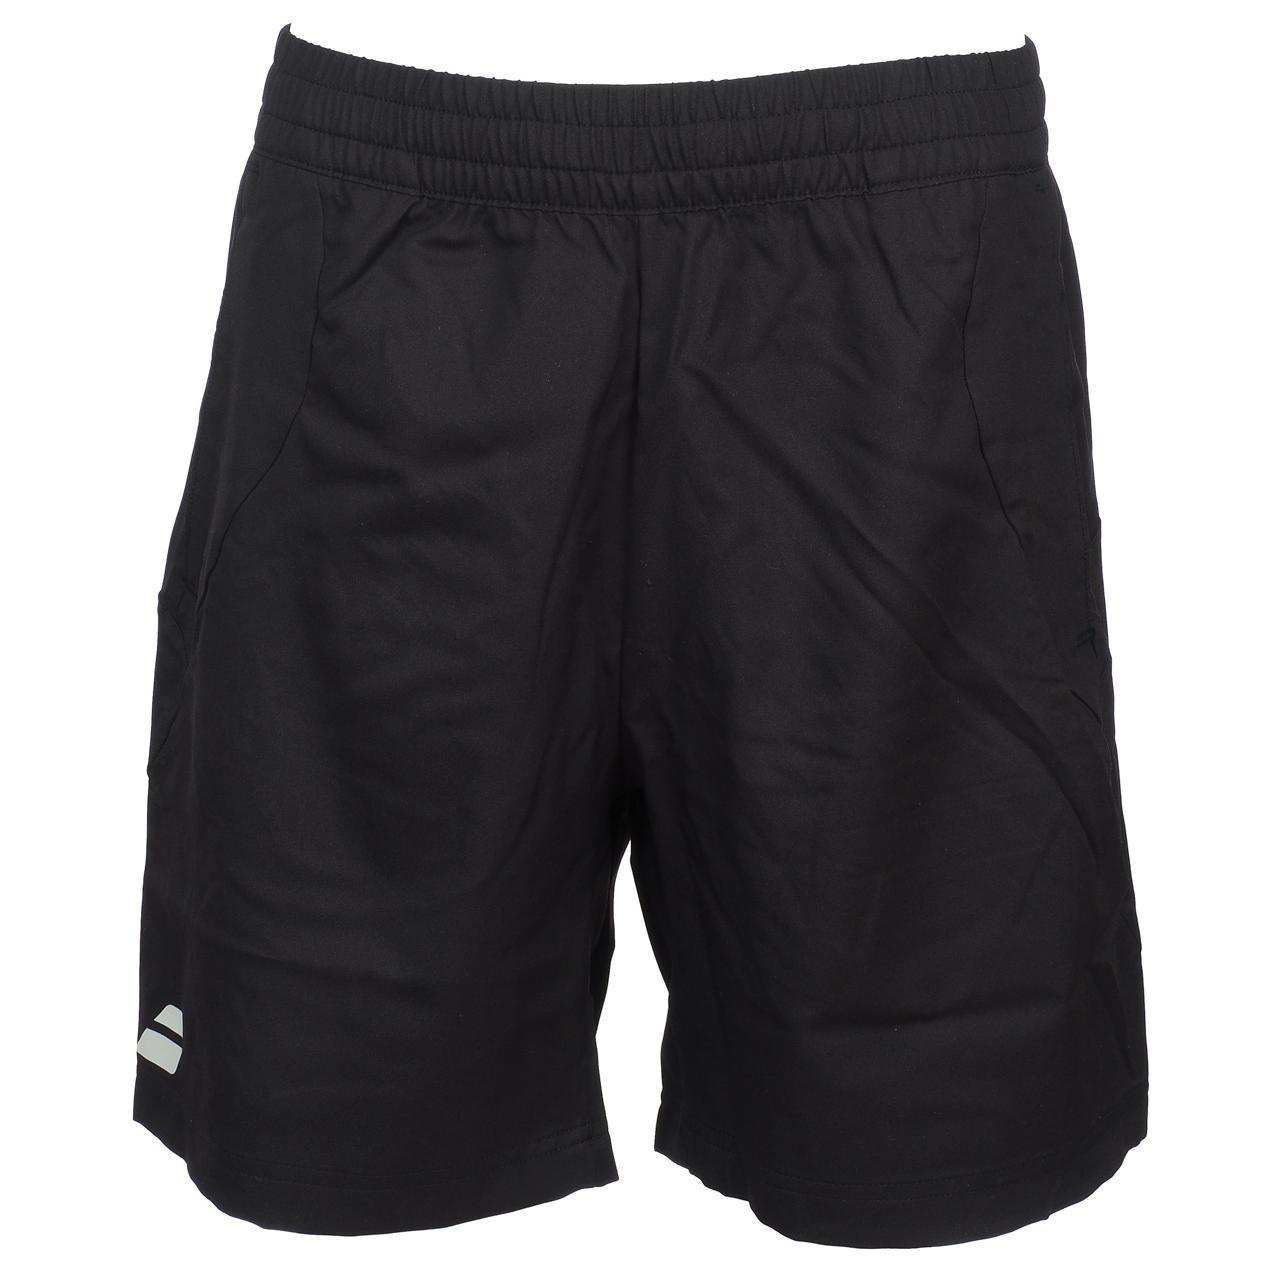 short-Tennis-Babolat-Shorts-Spiel-Core-Blk-Schwarz-70095-Neu